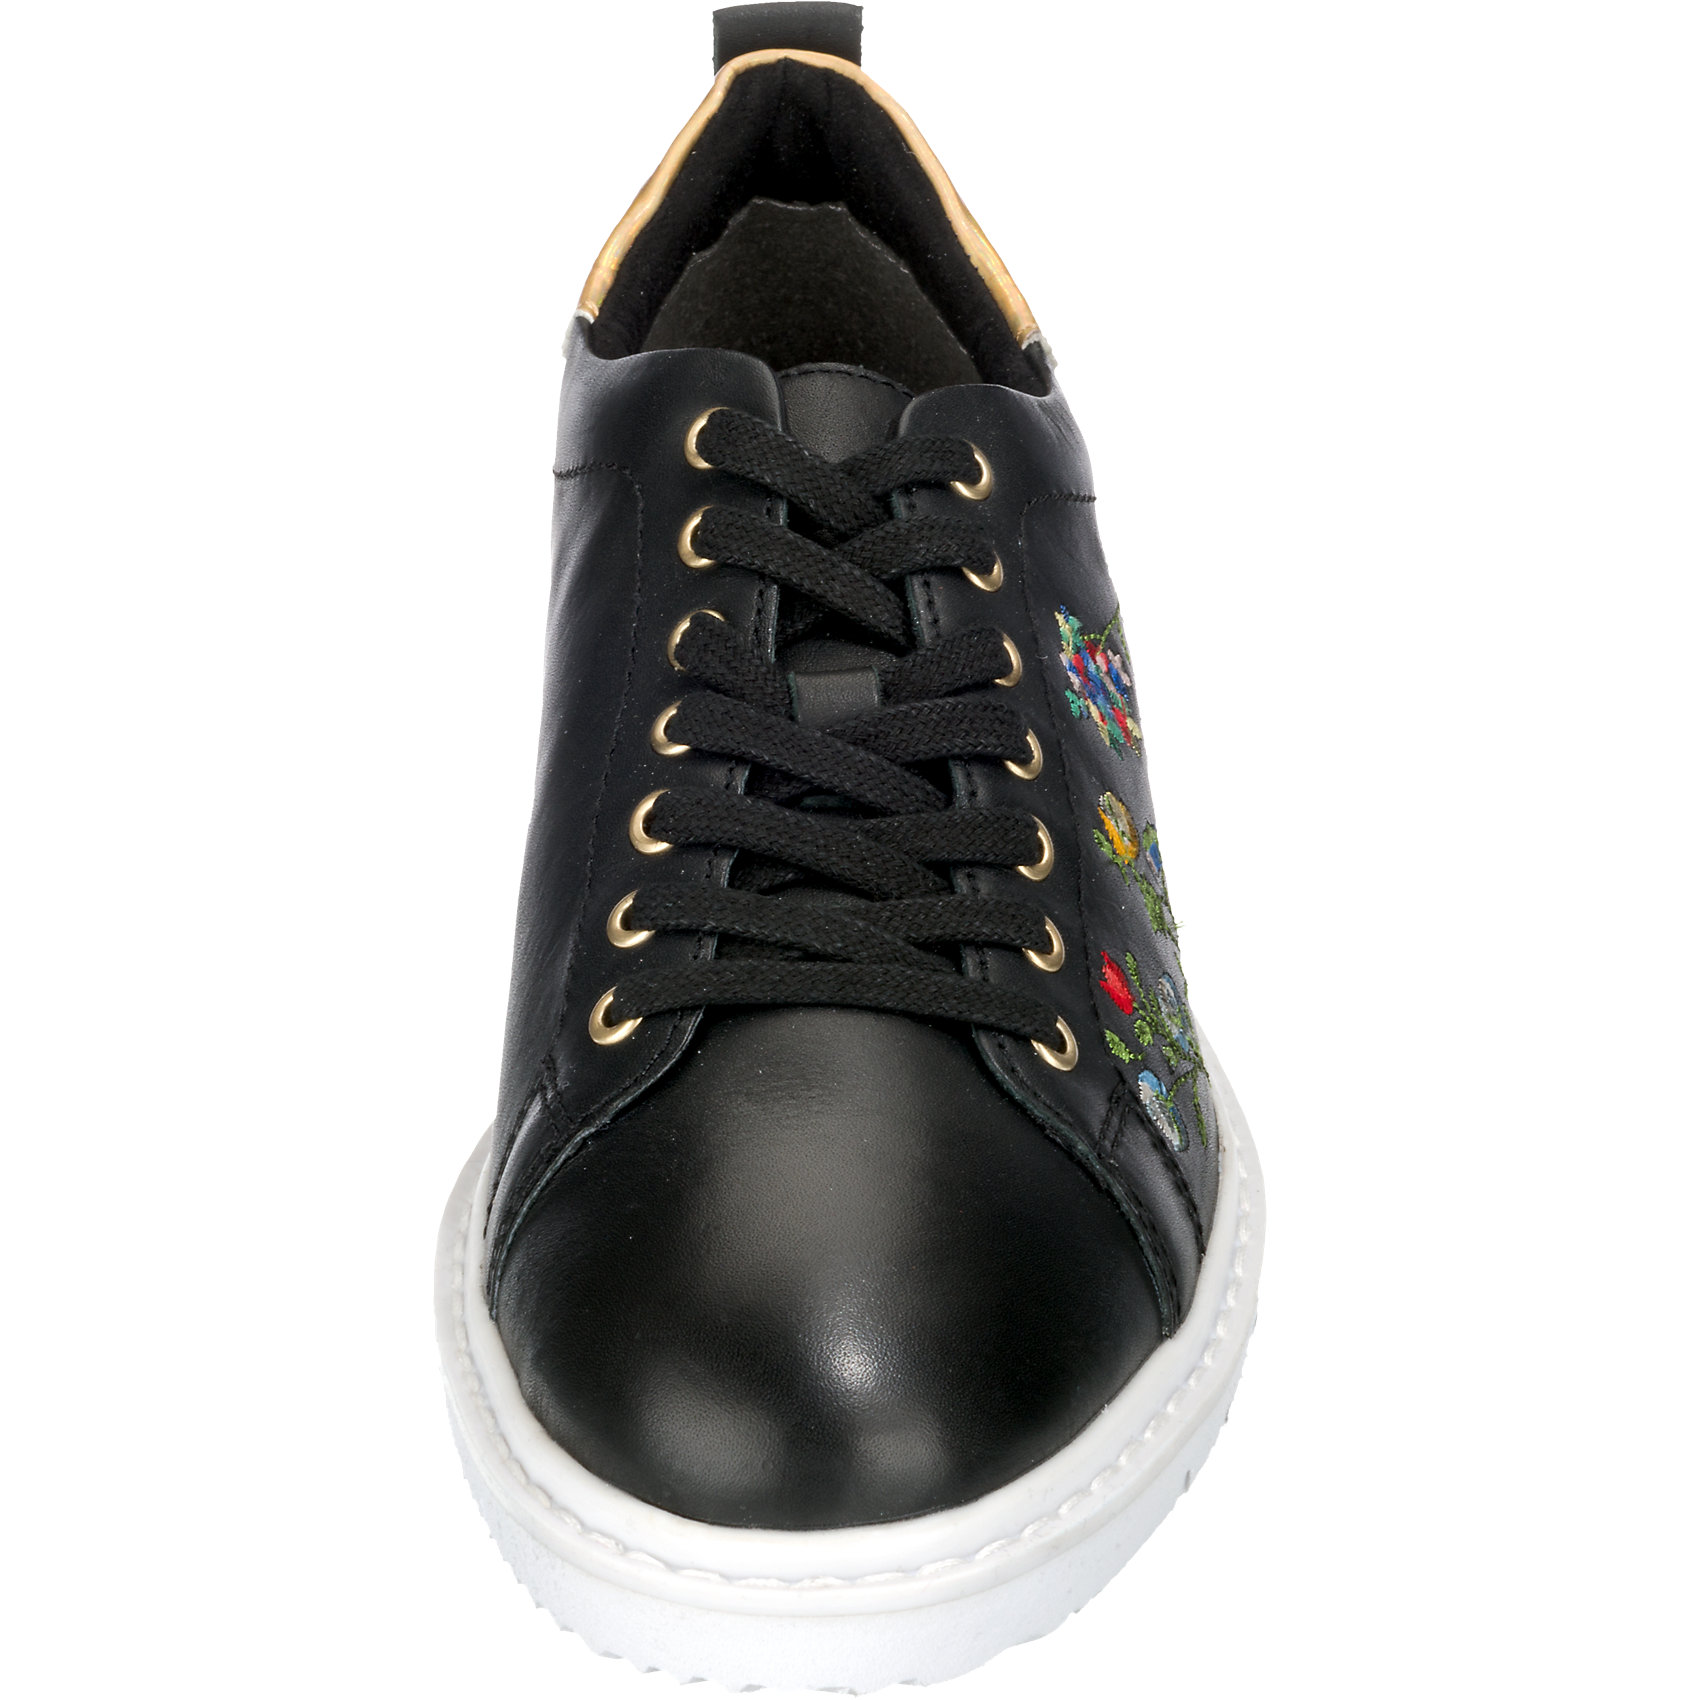 Neu Tamaris Ames Sneakers schwarz-kombi 5774937